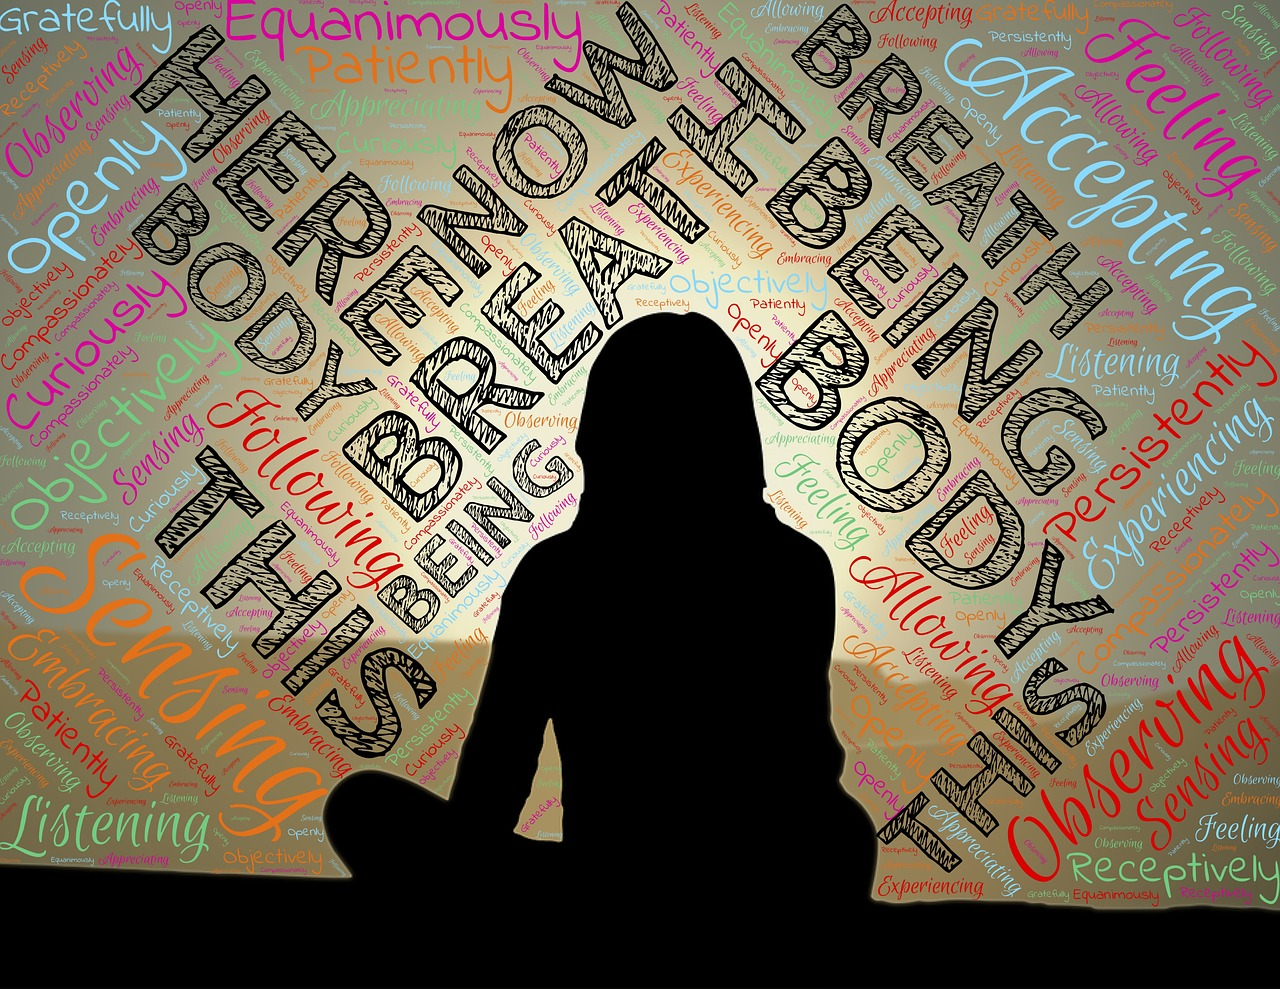 https://mlbyytp0evj0.i.optimole.com/w:960/h:989/q:auto/https://astroluna.rs/wp-content/uploads/2019/08/meditation-1837347_1280.jpg